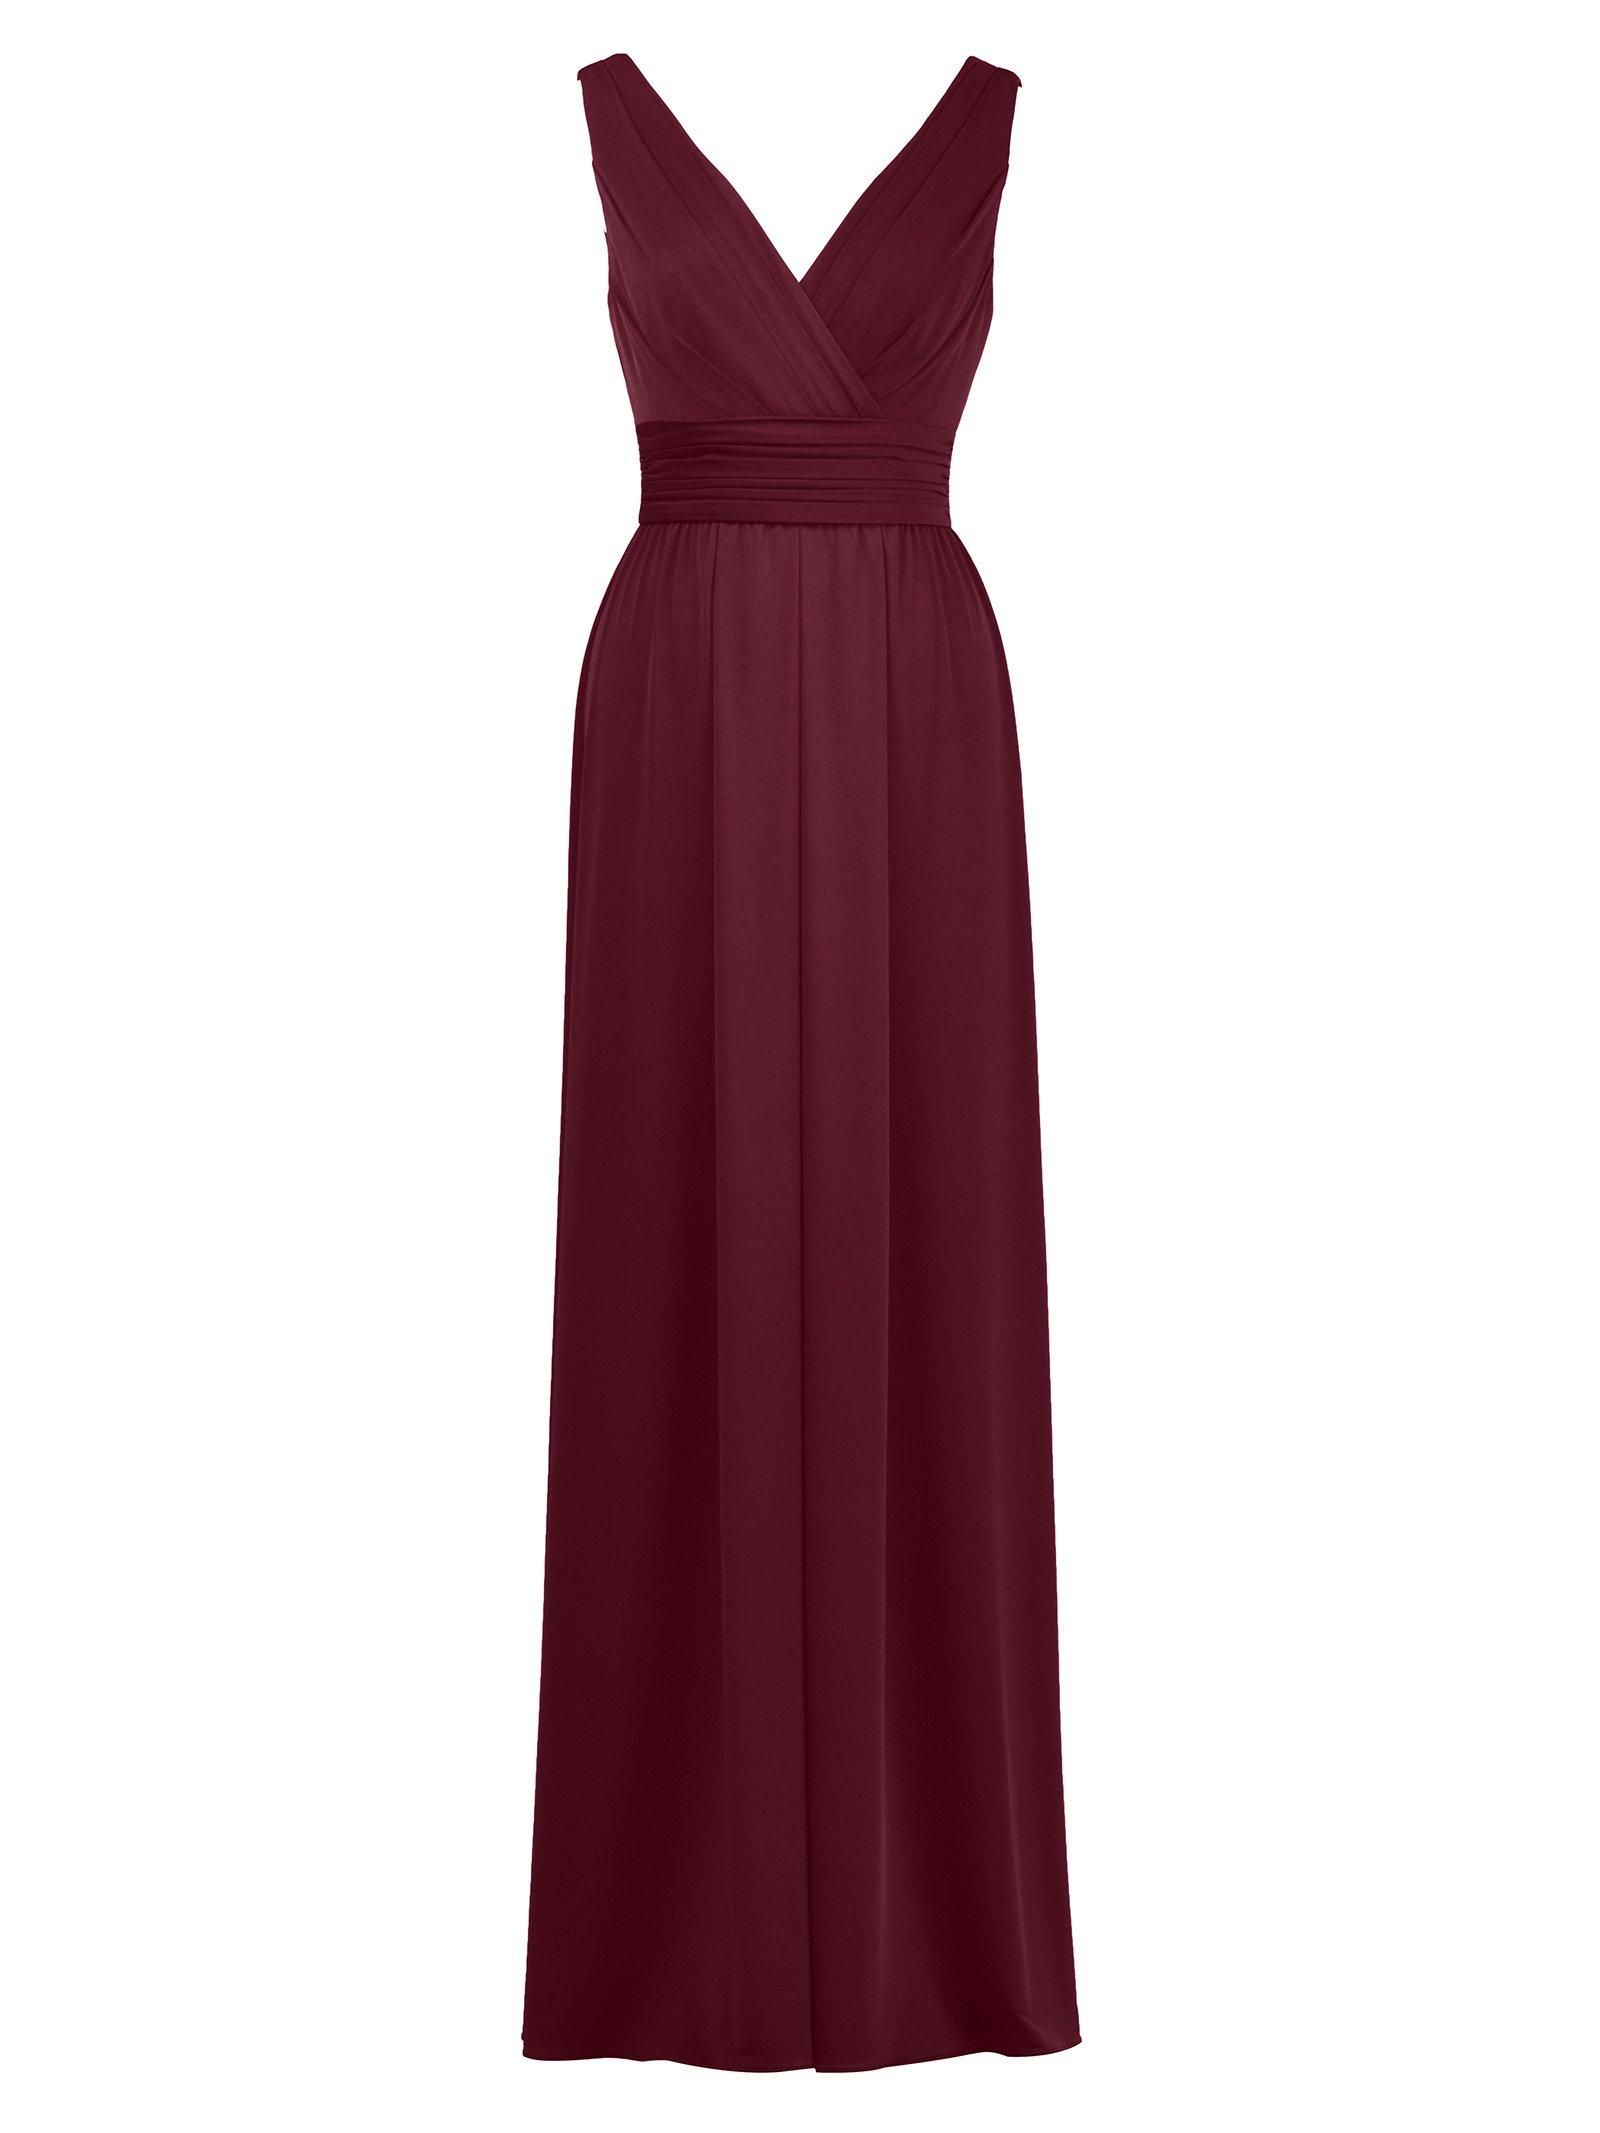 Alicepub V-Neck Long Jersey Gown Sleeveless Knit Formal Evening Dresses for Women